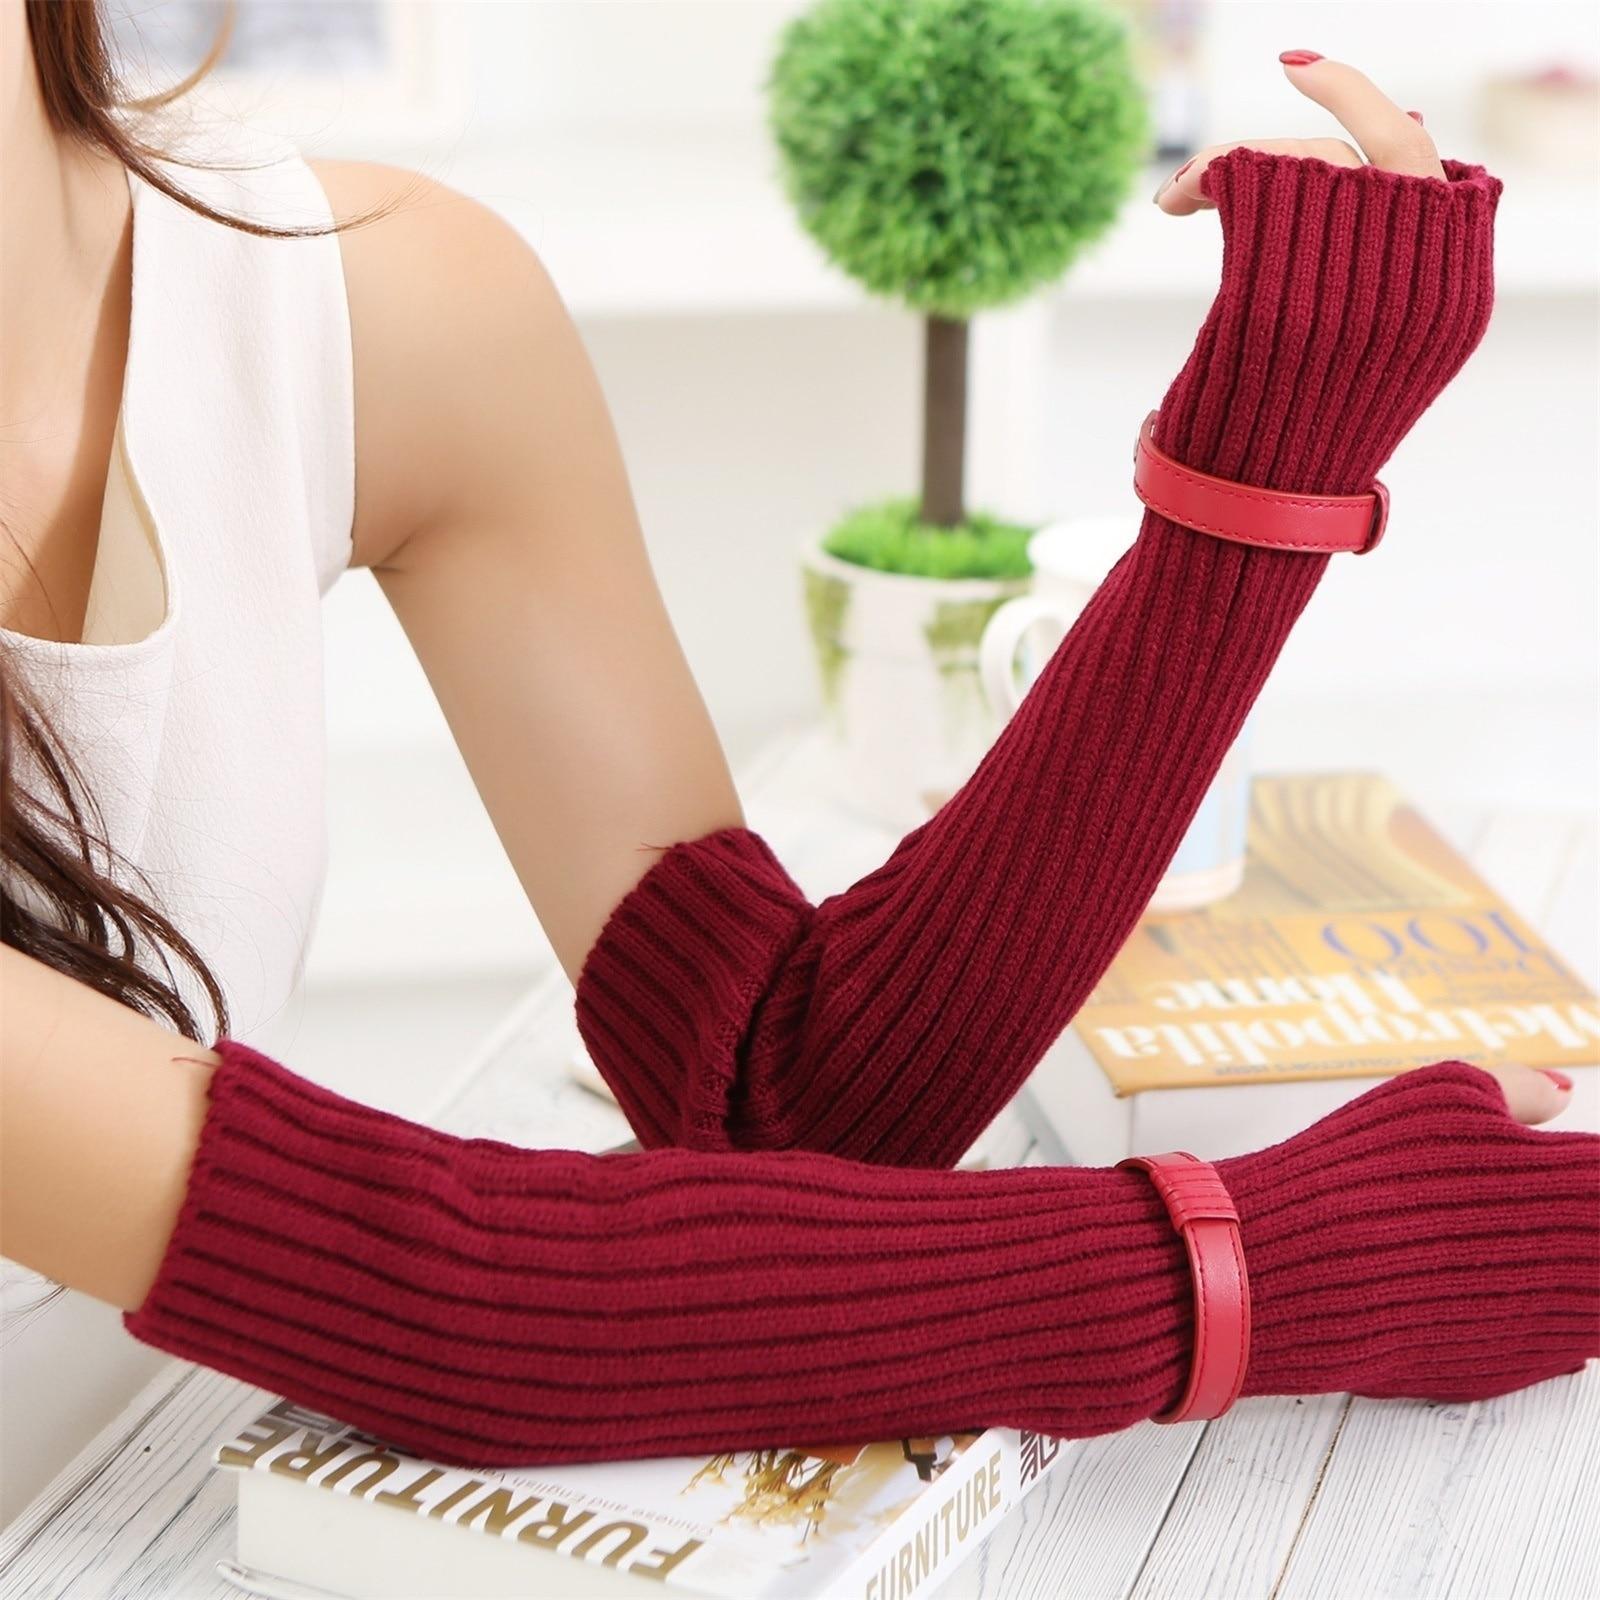 Unisex Men Women Long Gloves Cute Mittens Long Arm Warmer Gloves Fingerless Knitted Gloves